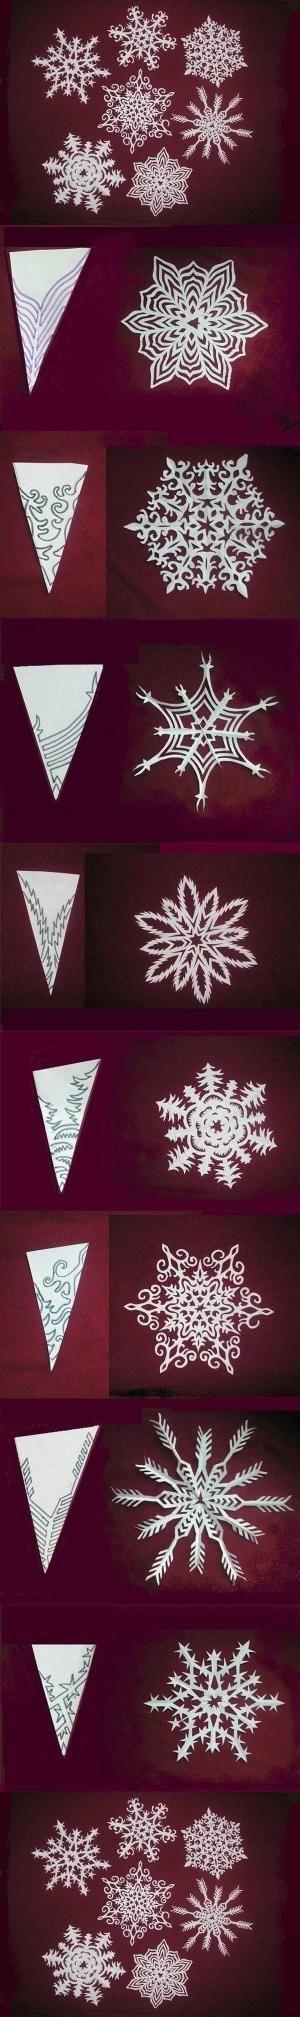 A noi i cristalli di neve piacciono troppo! DIY Snowflakes Paper Pattern Tutorial via usefuldiy.com by RLynne6001